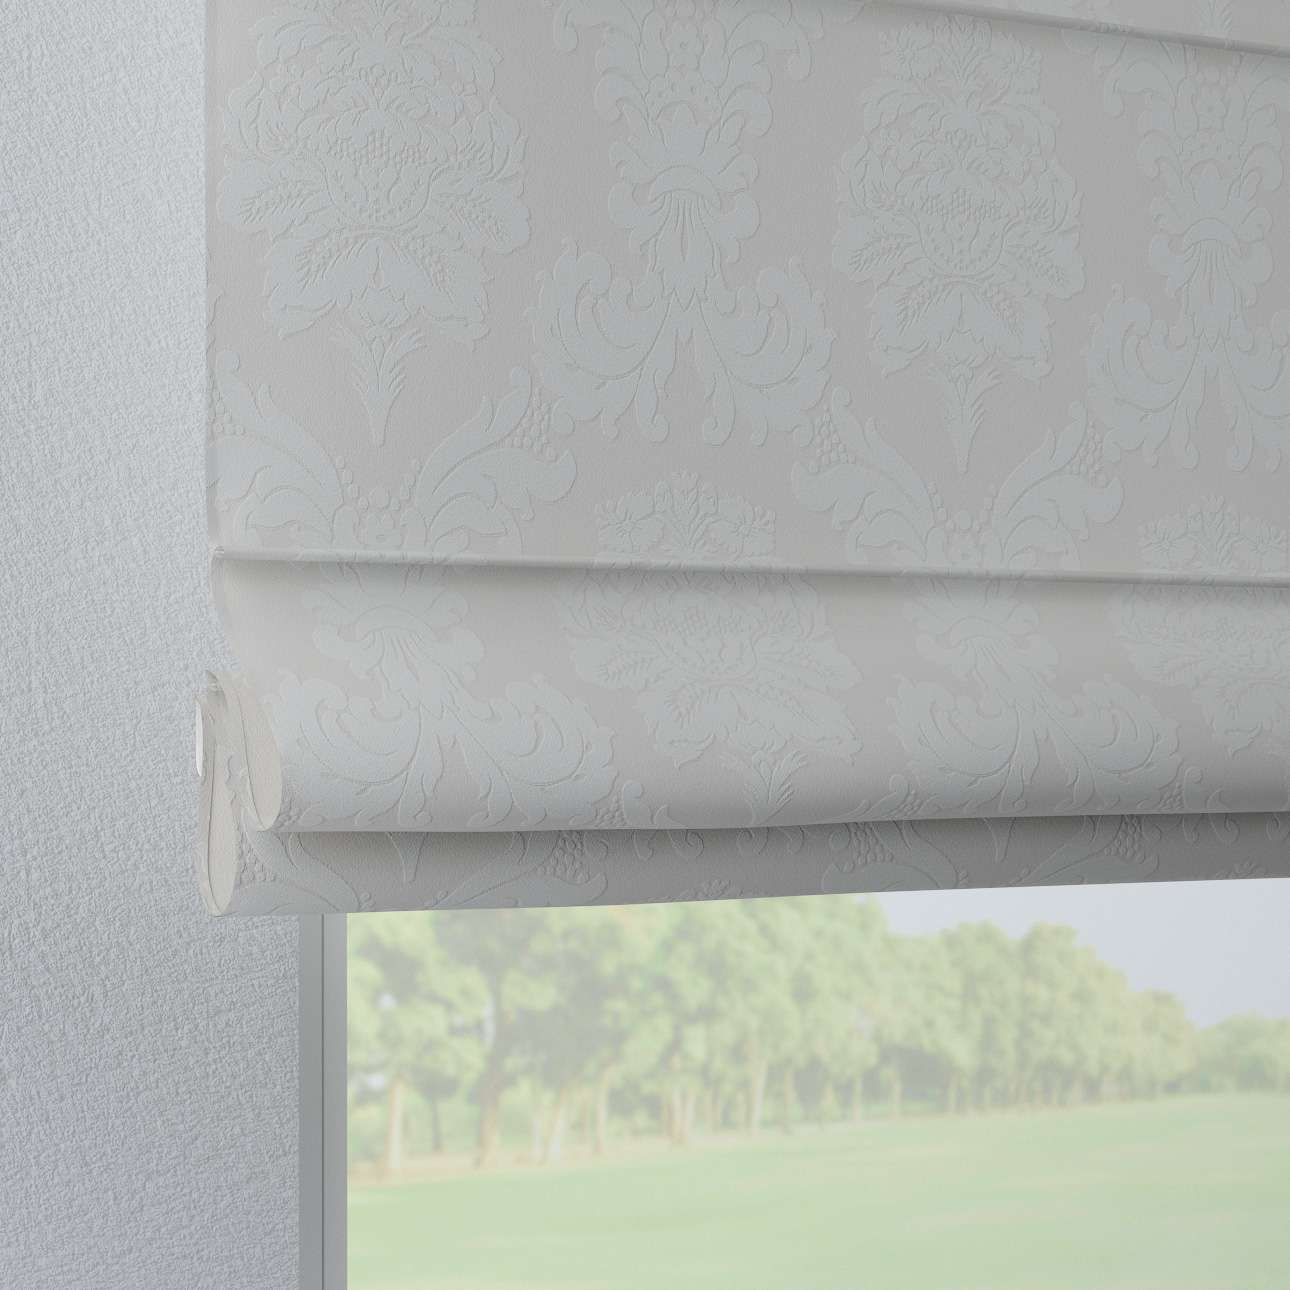 Foldegardin Verona<br/>Med stropper til gardinstang 80 x 170 cm fra kollektionen Damasco, Stof: 613-81